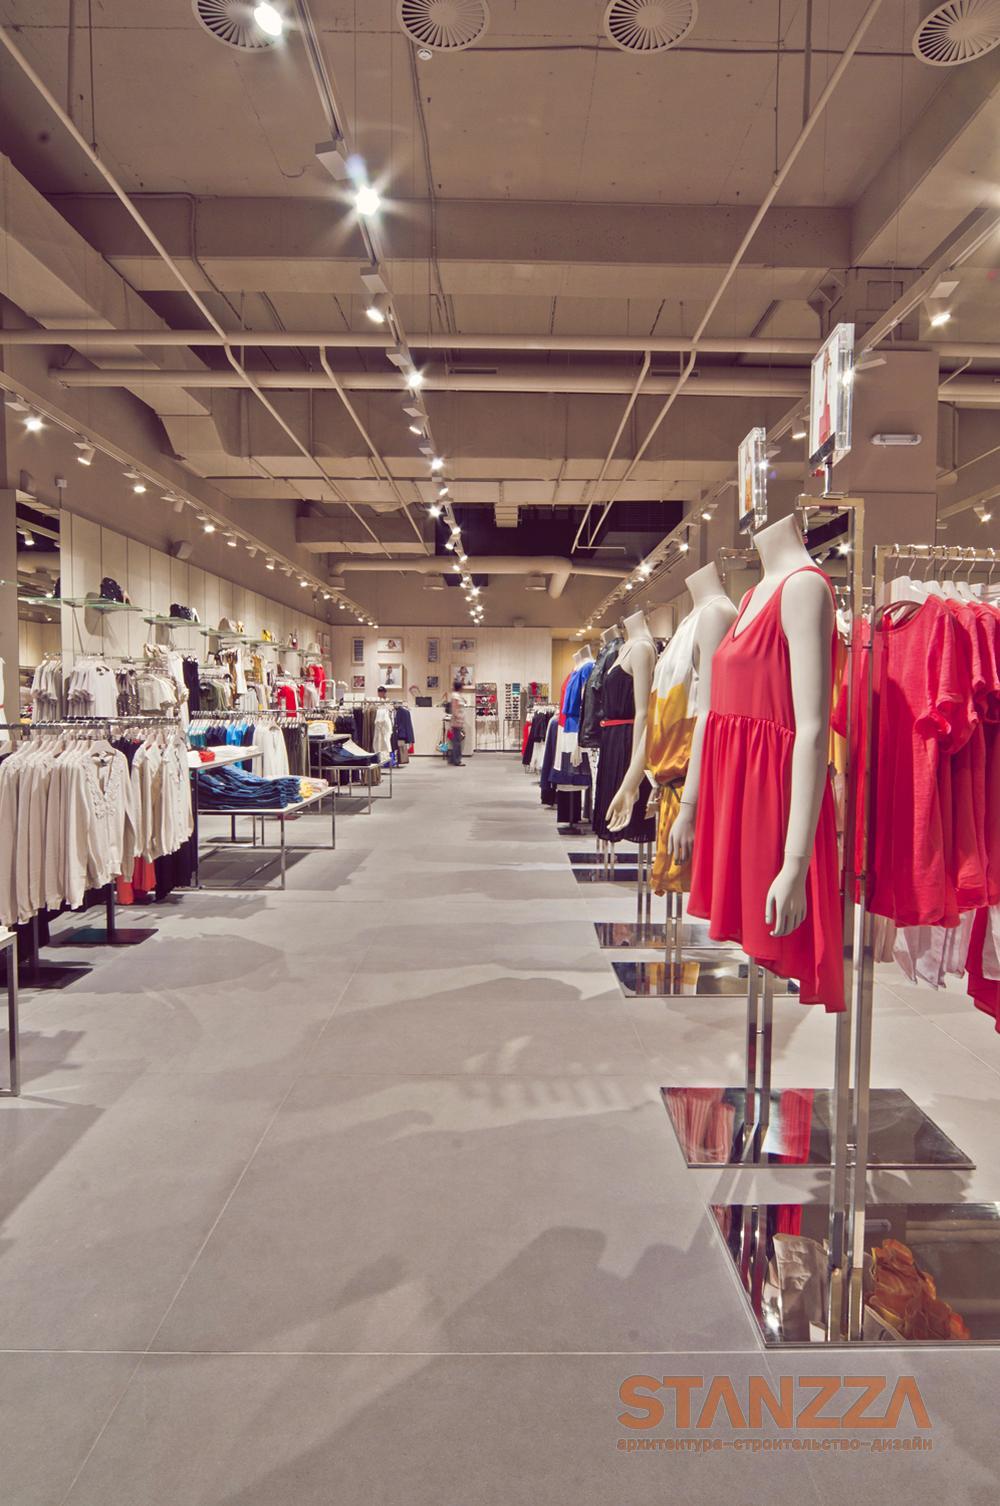 Mango Fashion Store Stanzza # Muebles Fashion